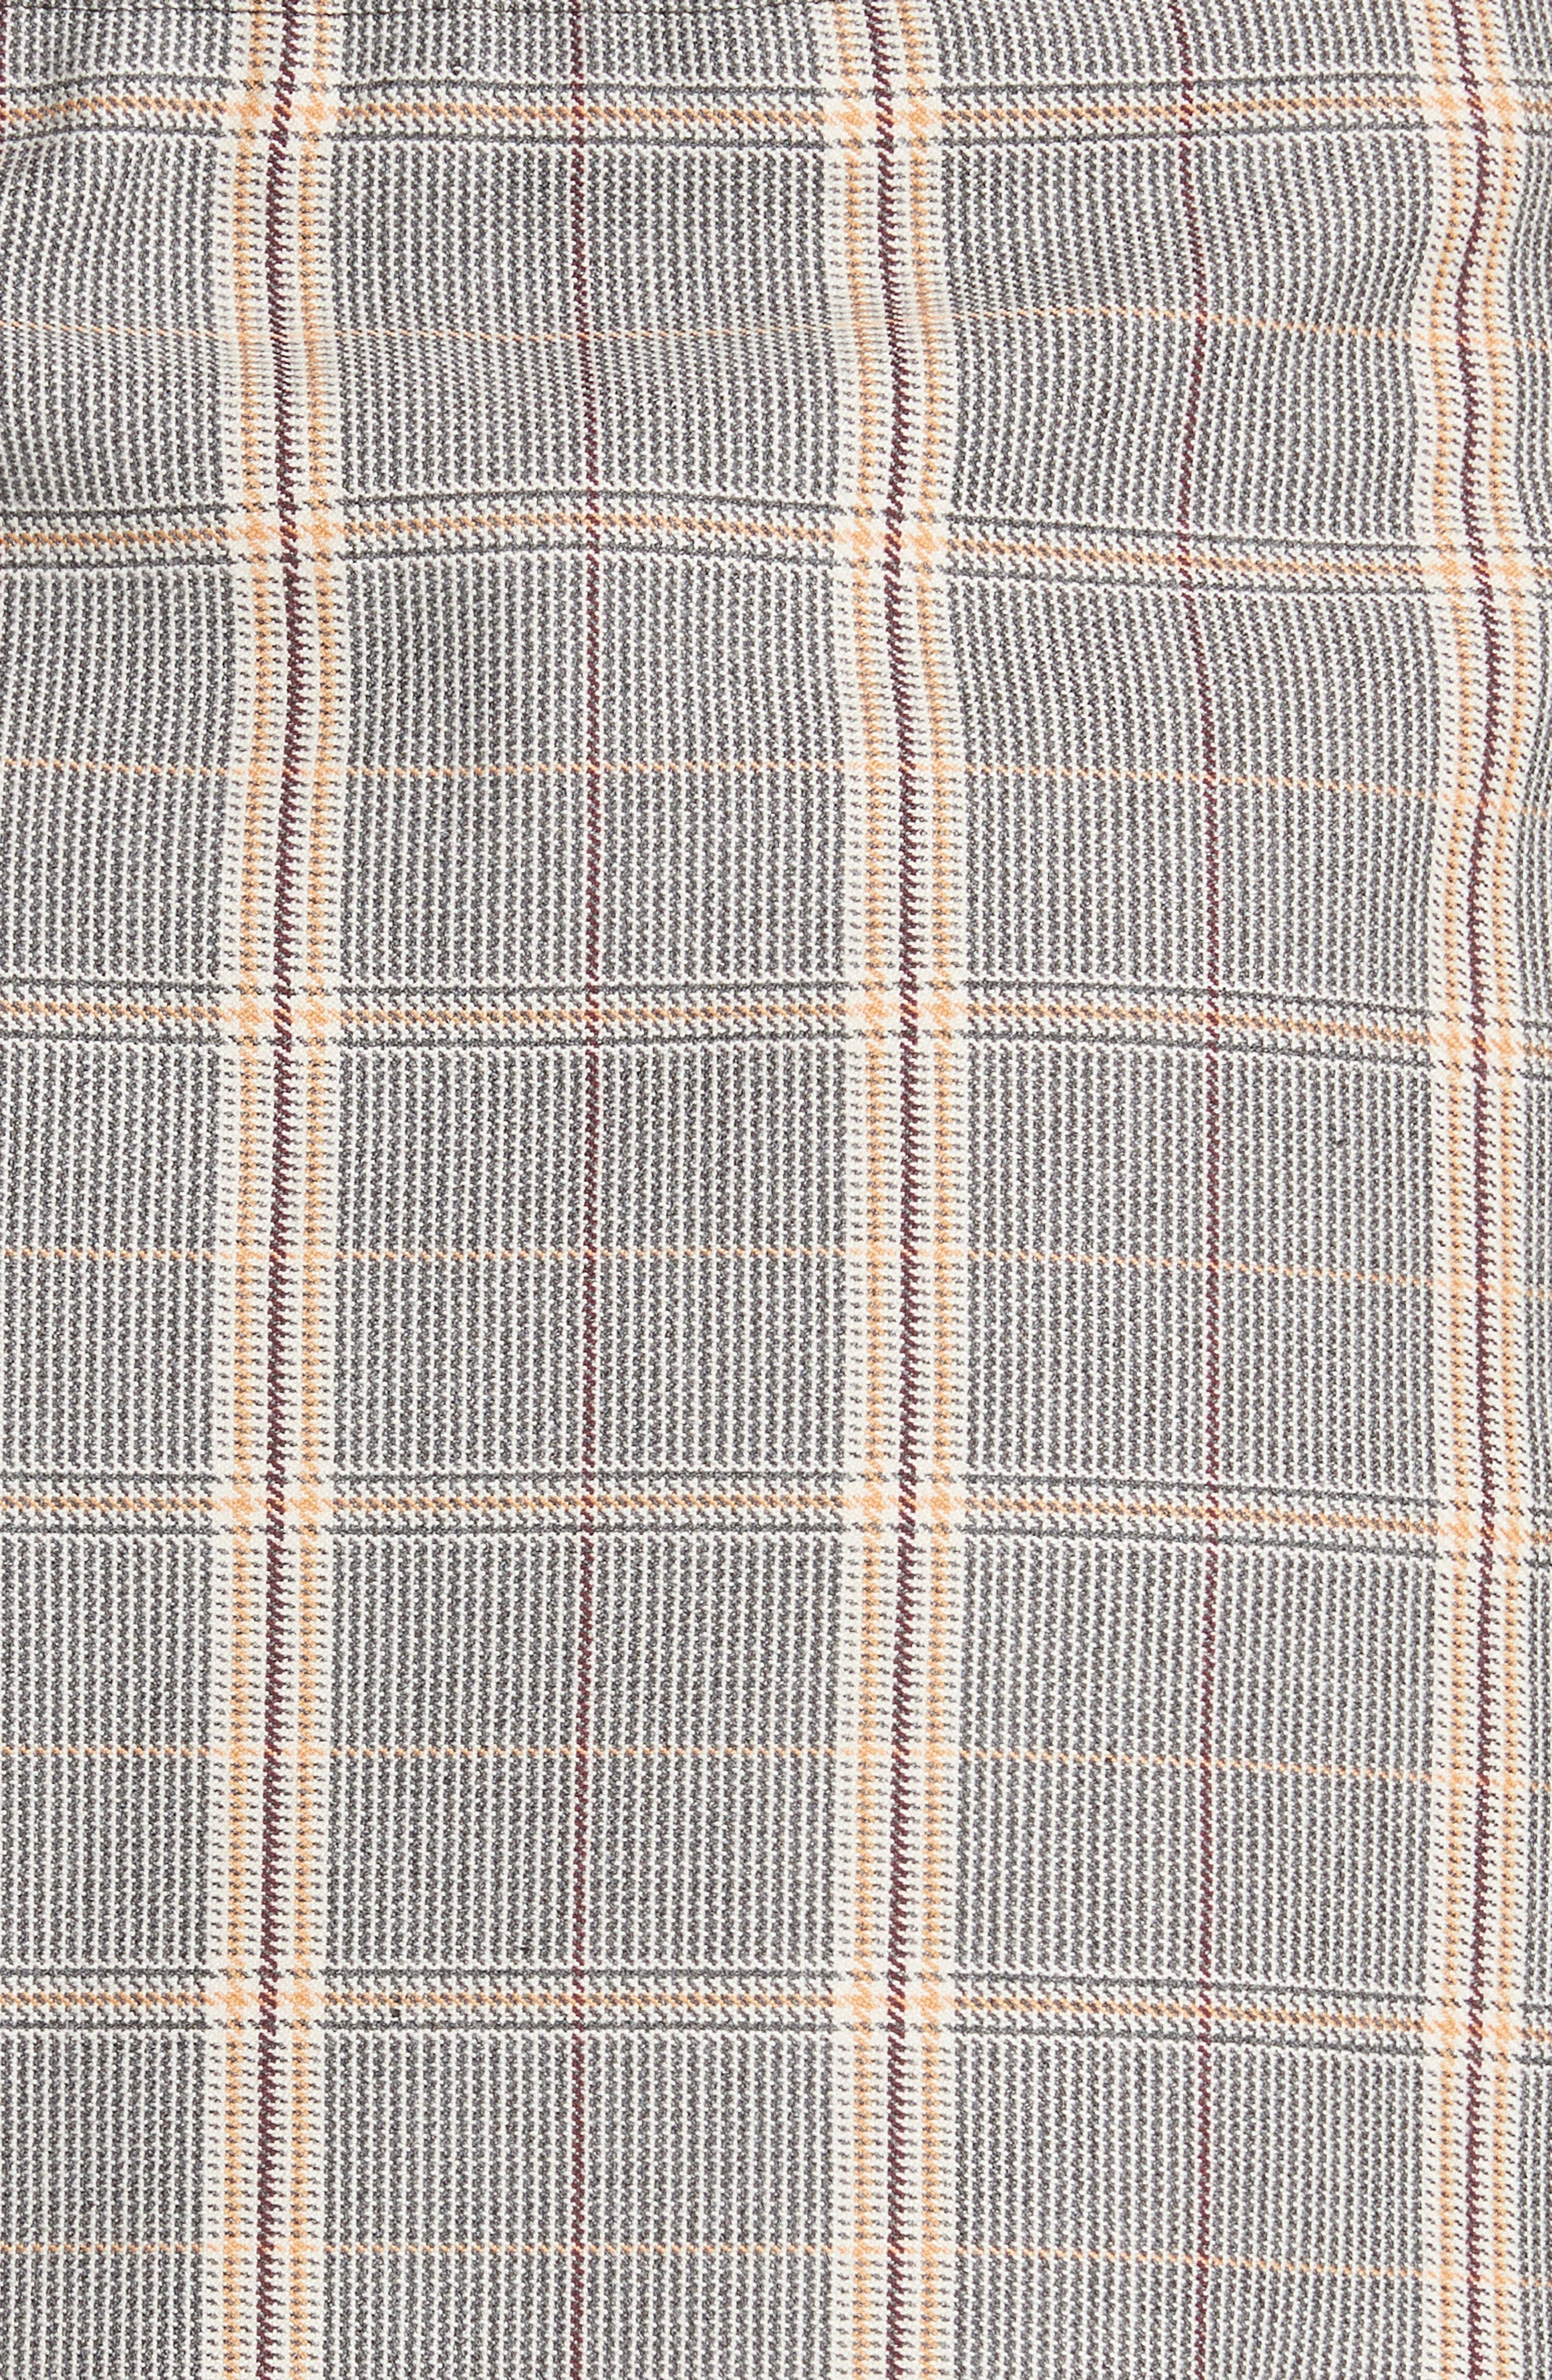 Plaid Skirt Front Shorts,                             Alternate thumbnail 5, color,                             020